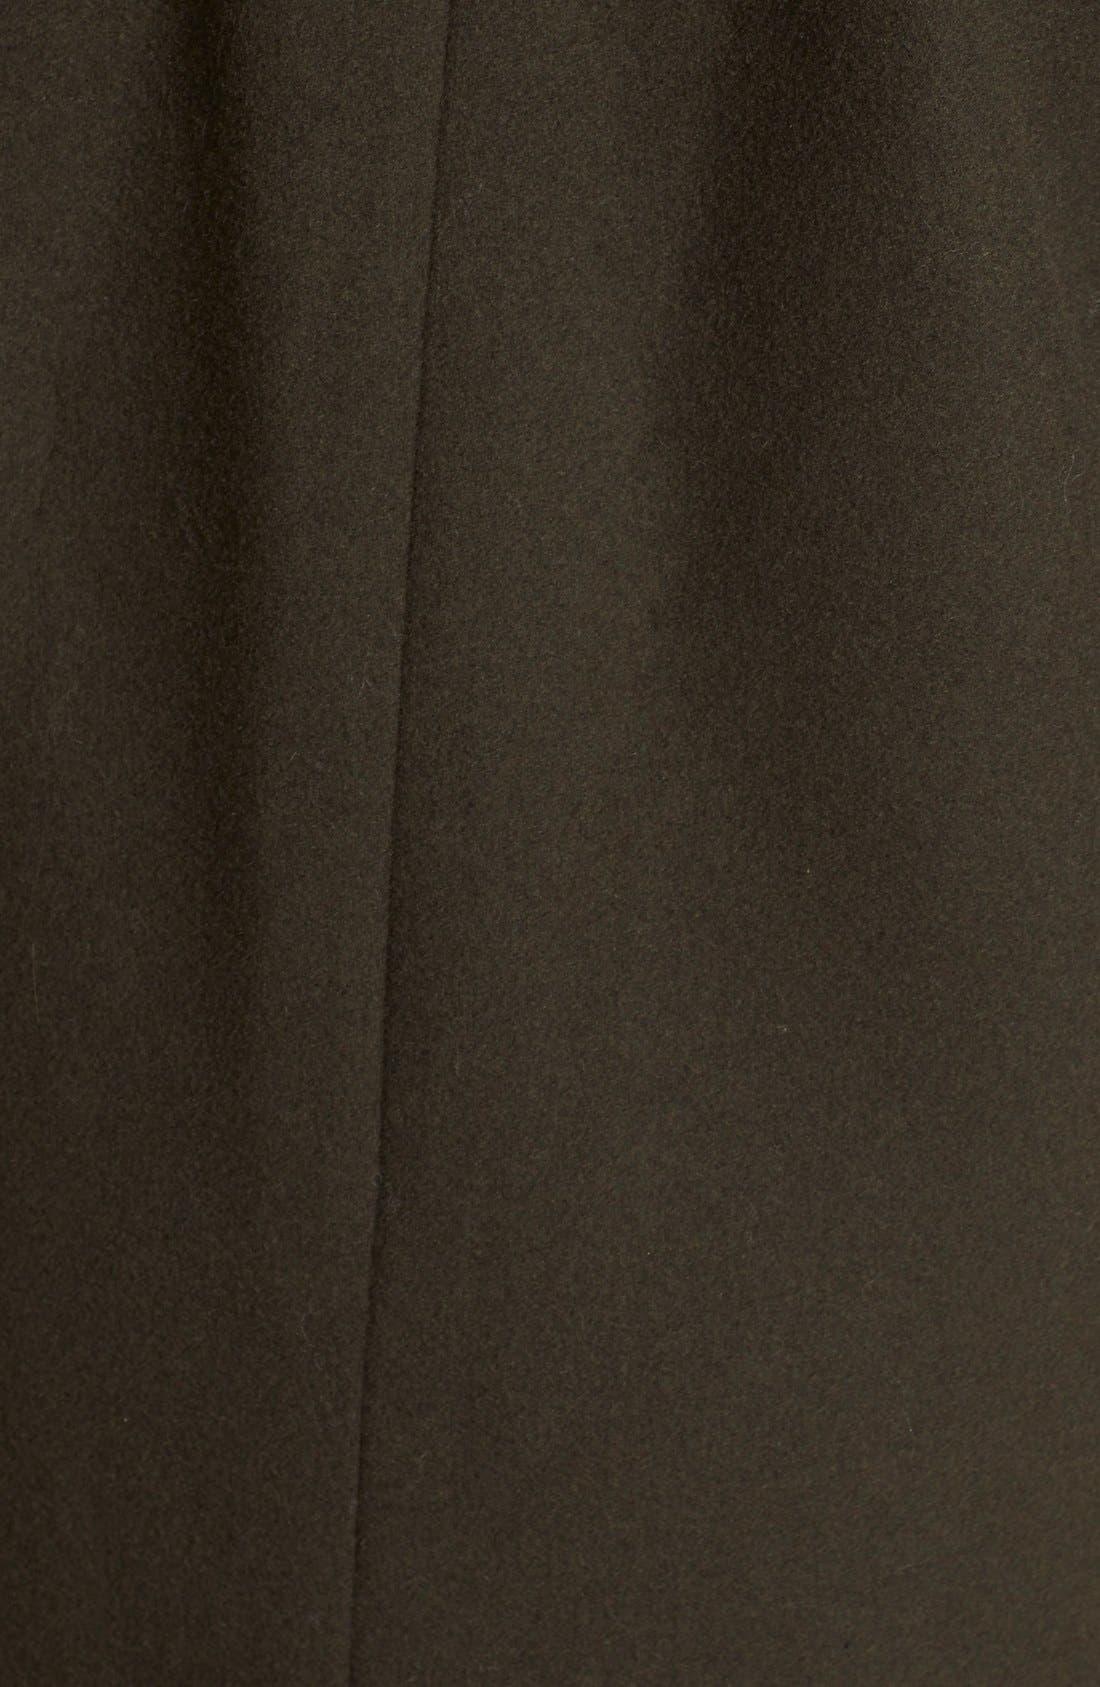 Alternate Image 4  - Vince Camuto Wool Blend Duffle Coat